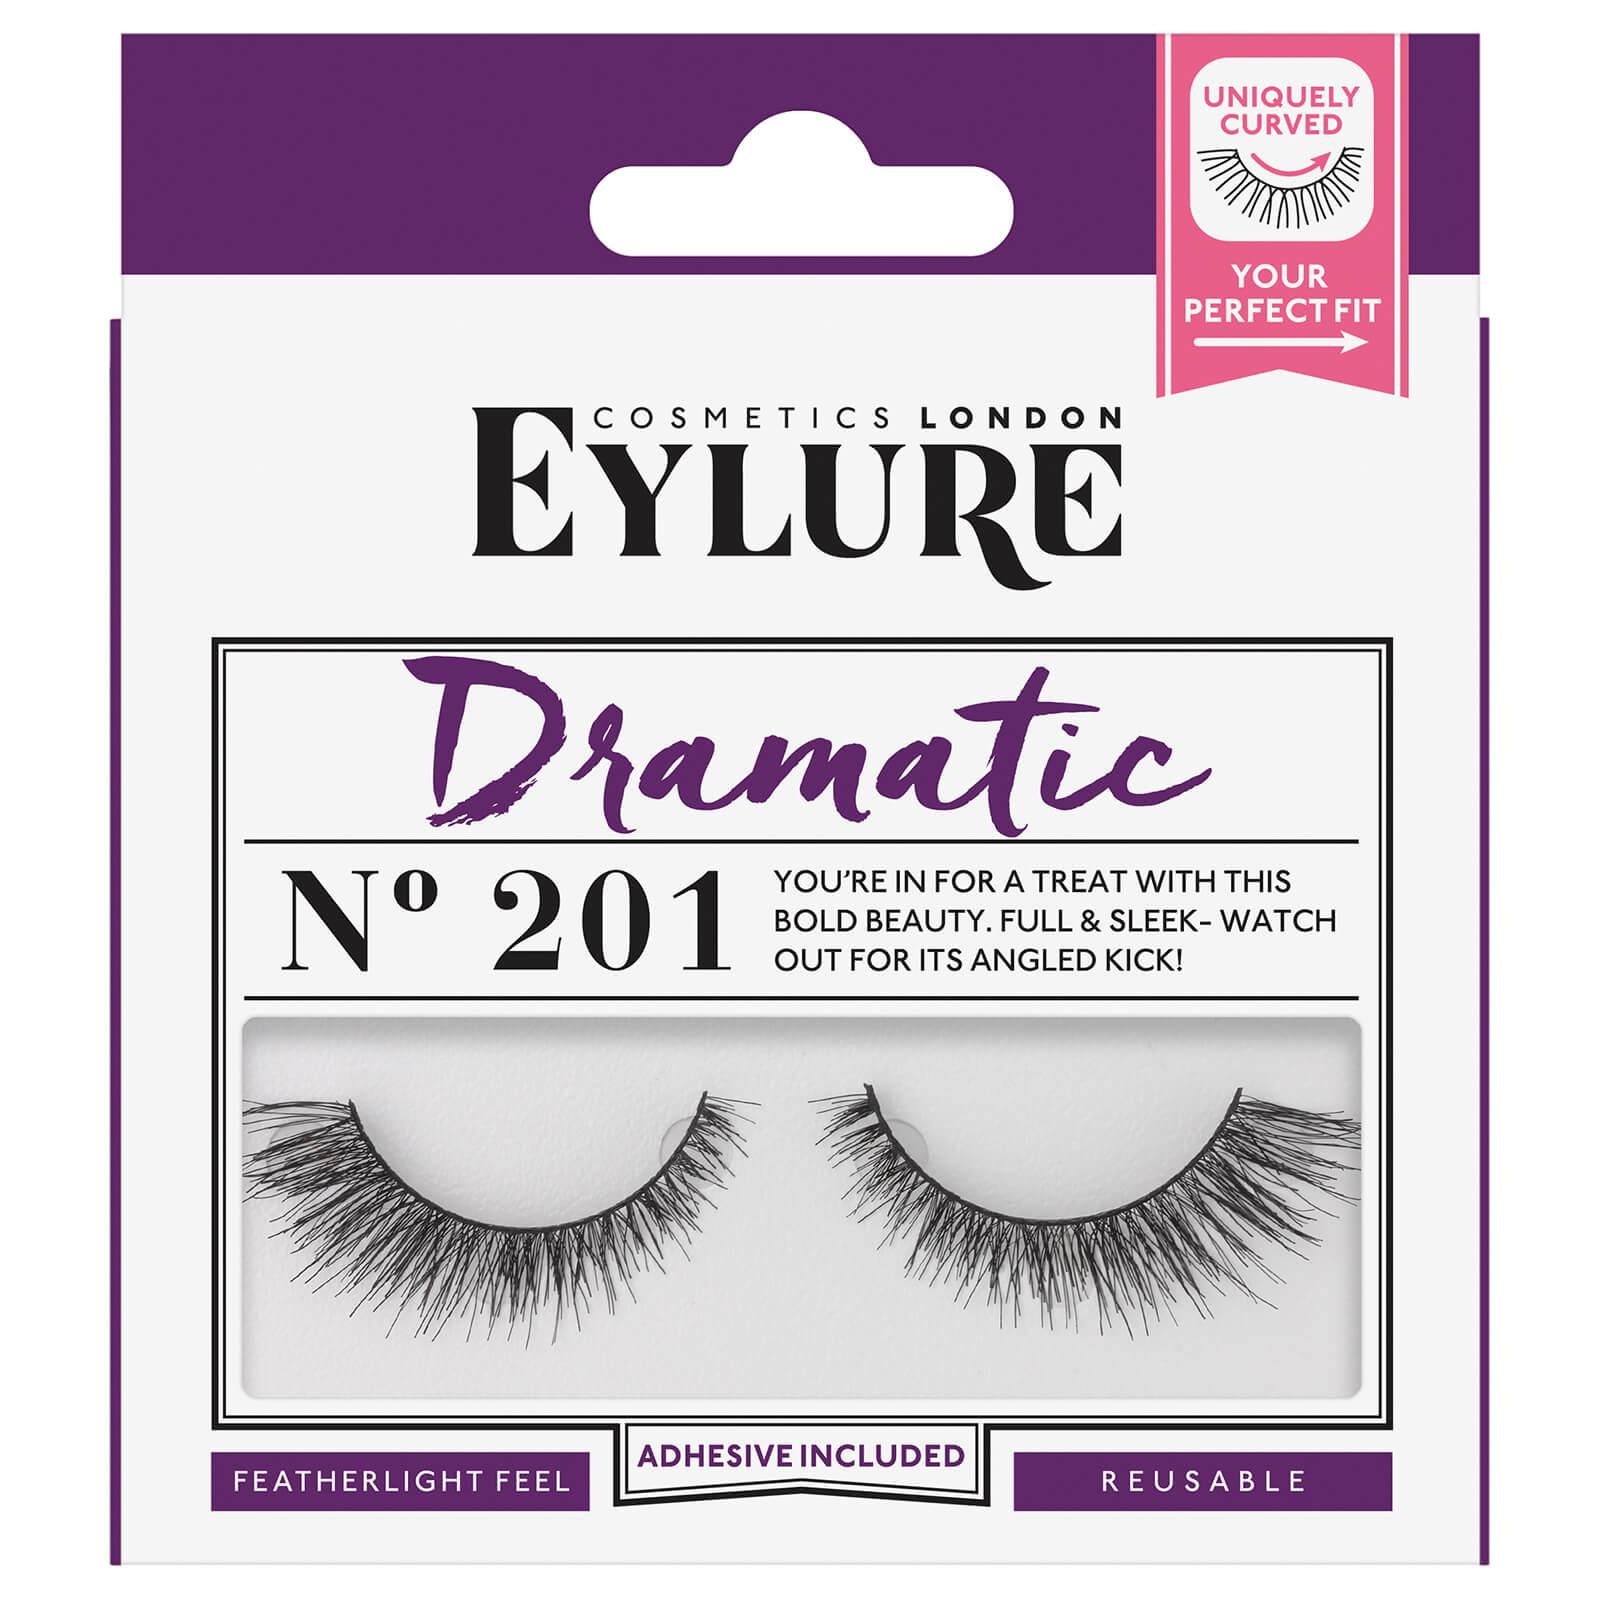 75596800e3c Eylure Dramatic No.201 Lashes | Free US Shipping | lookfantastic